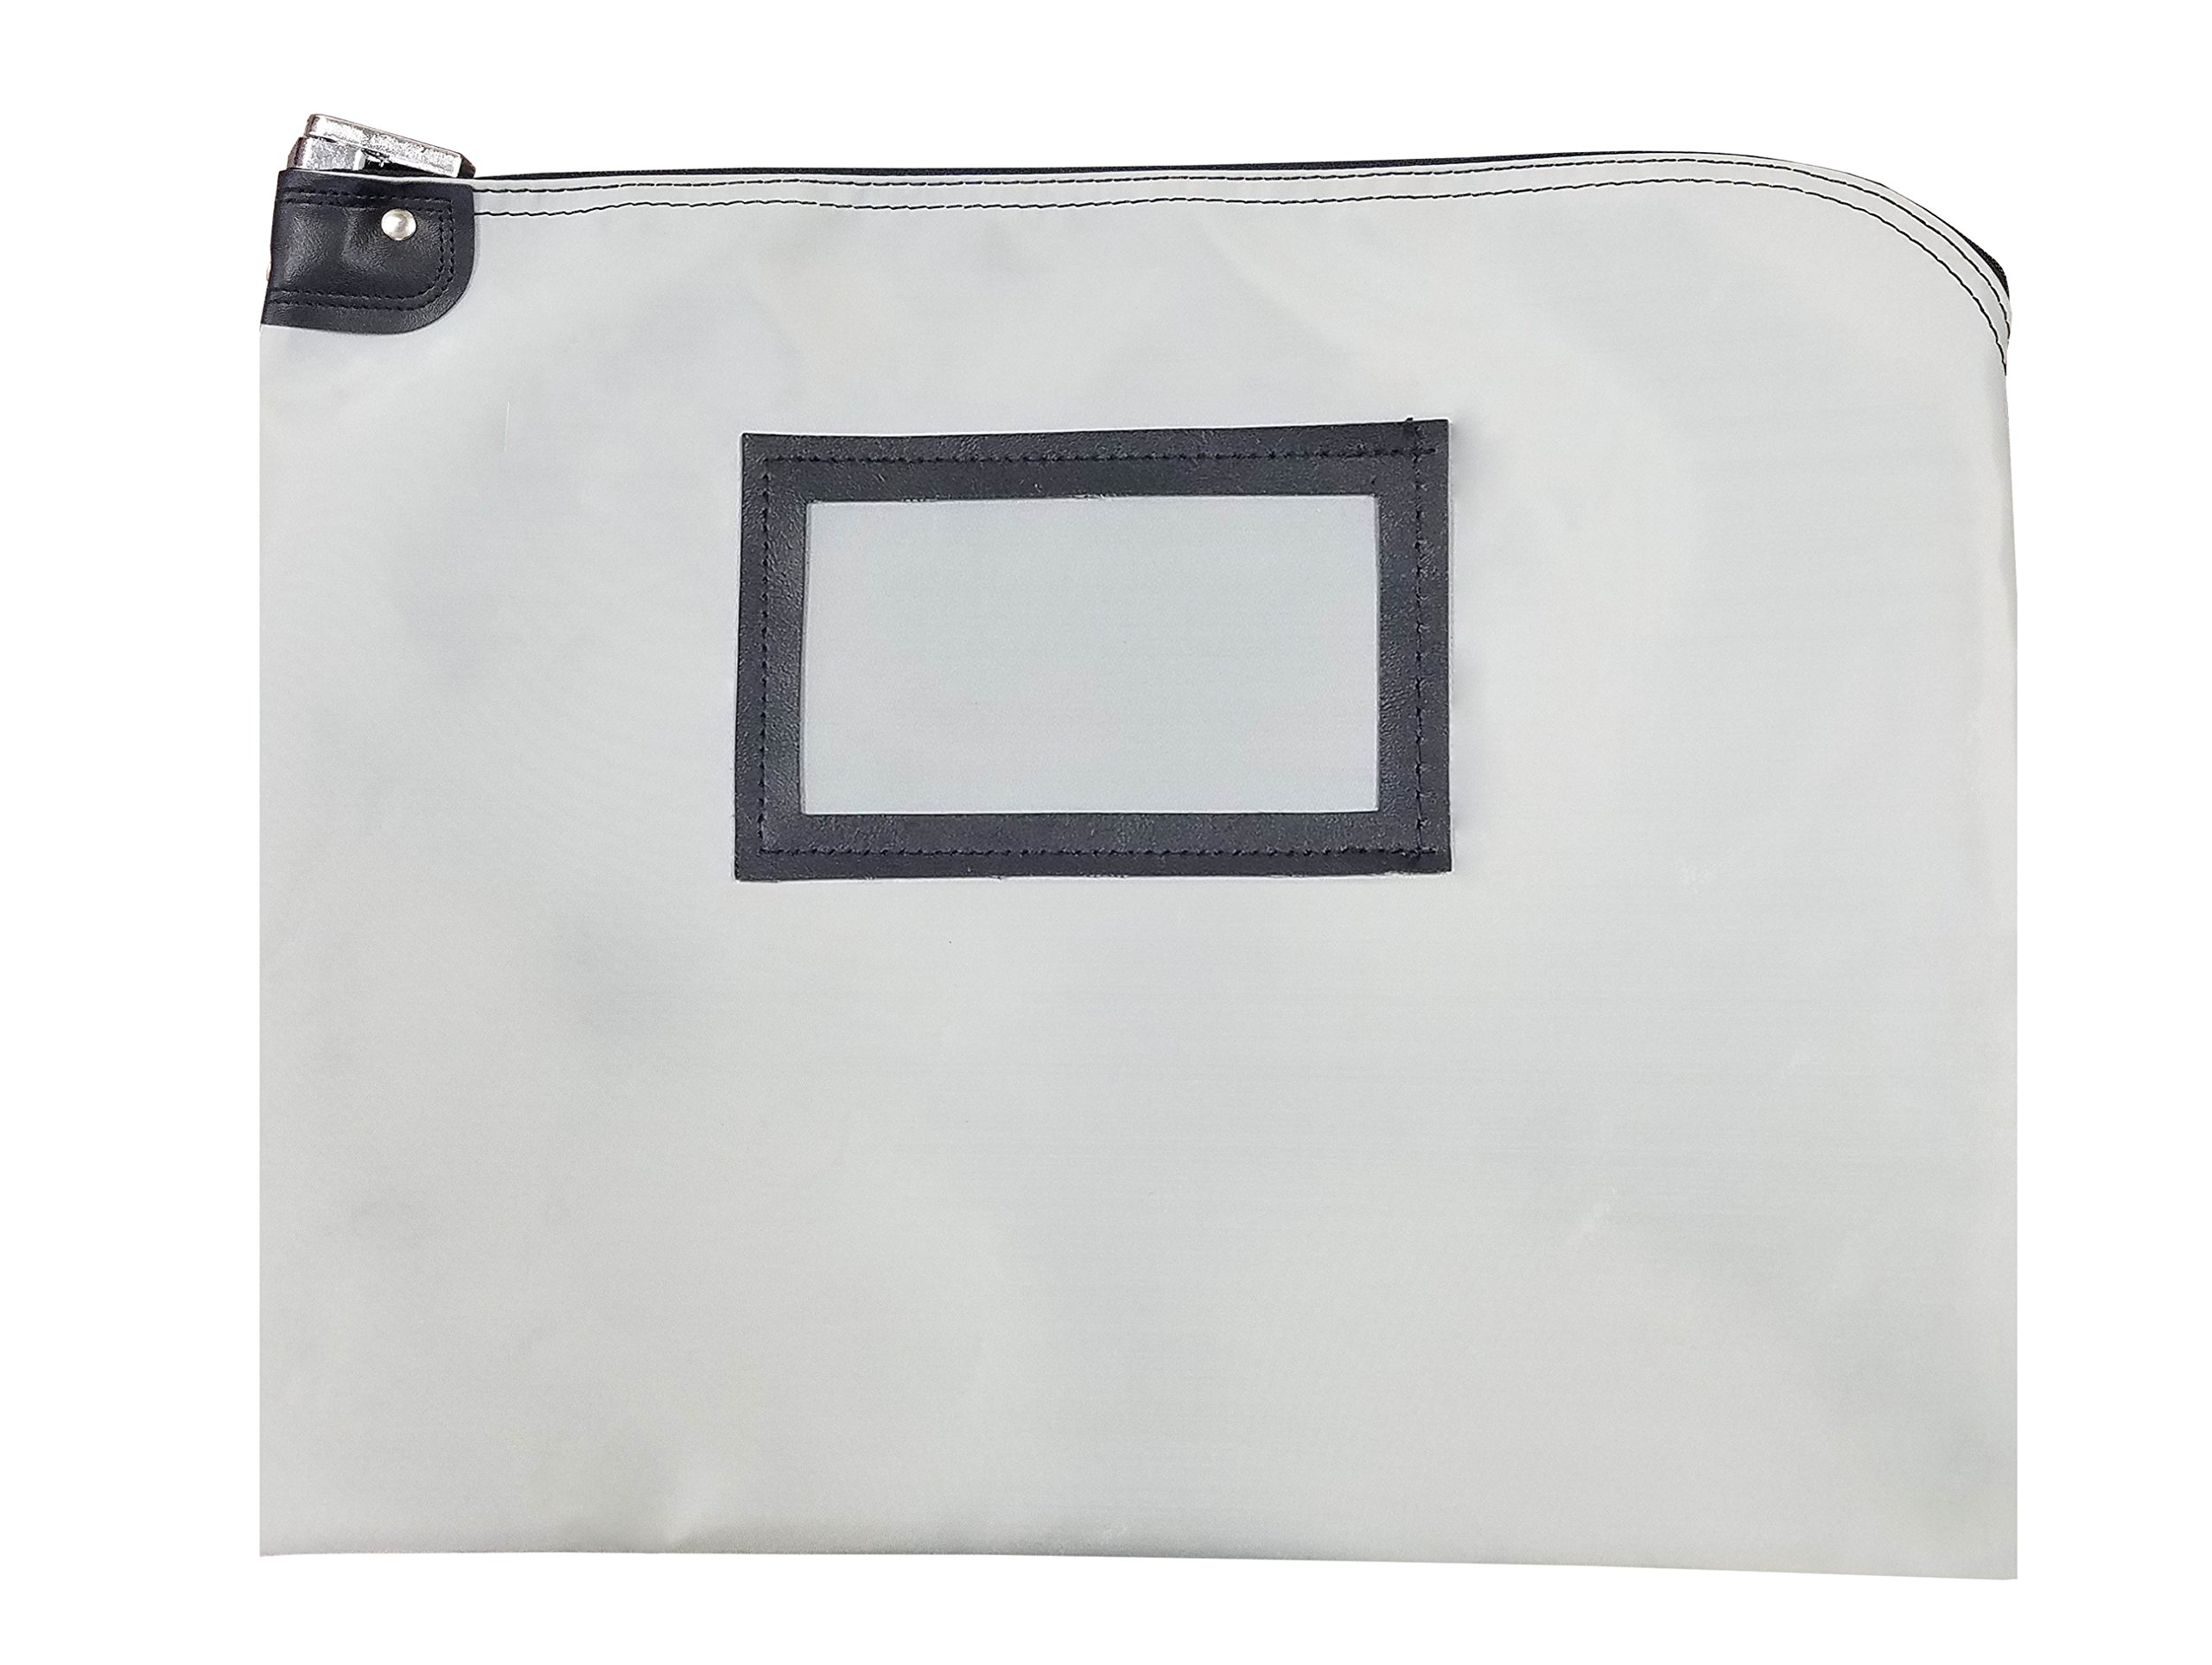 Locking Document Security HIPAA Bag (Gray)